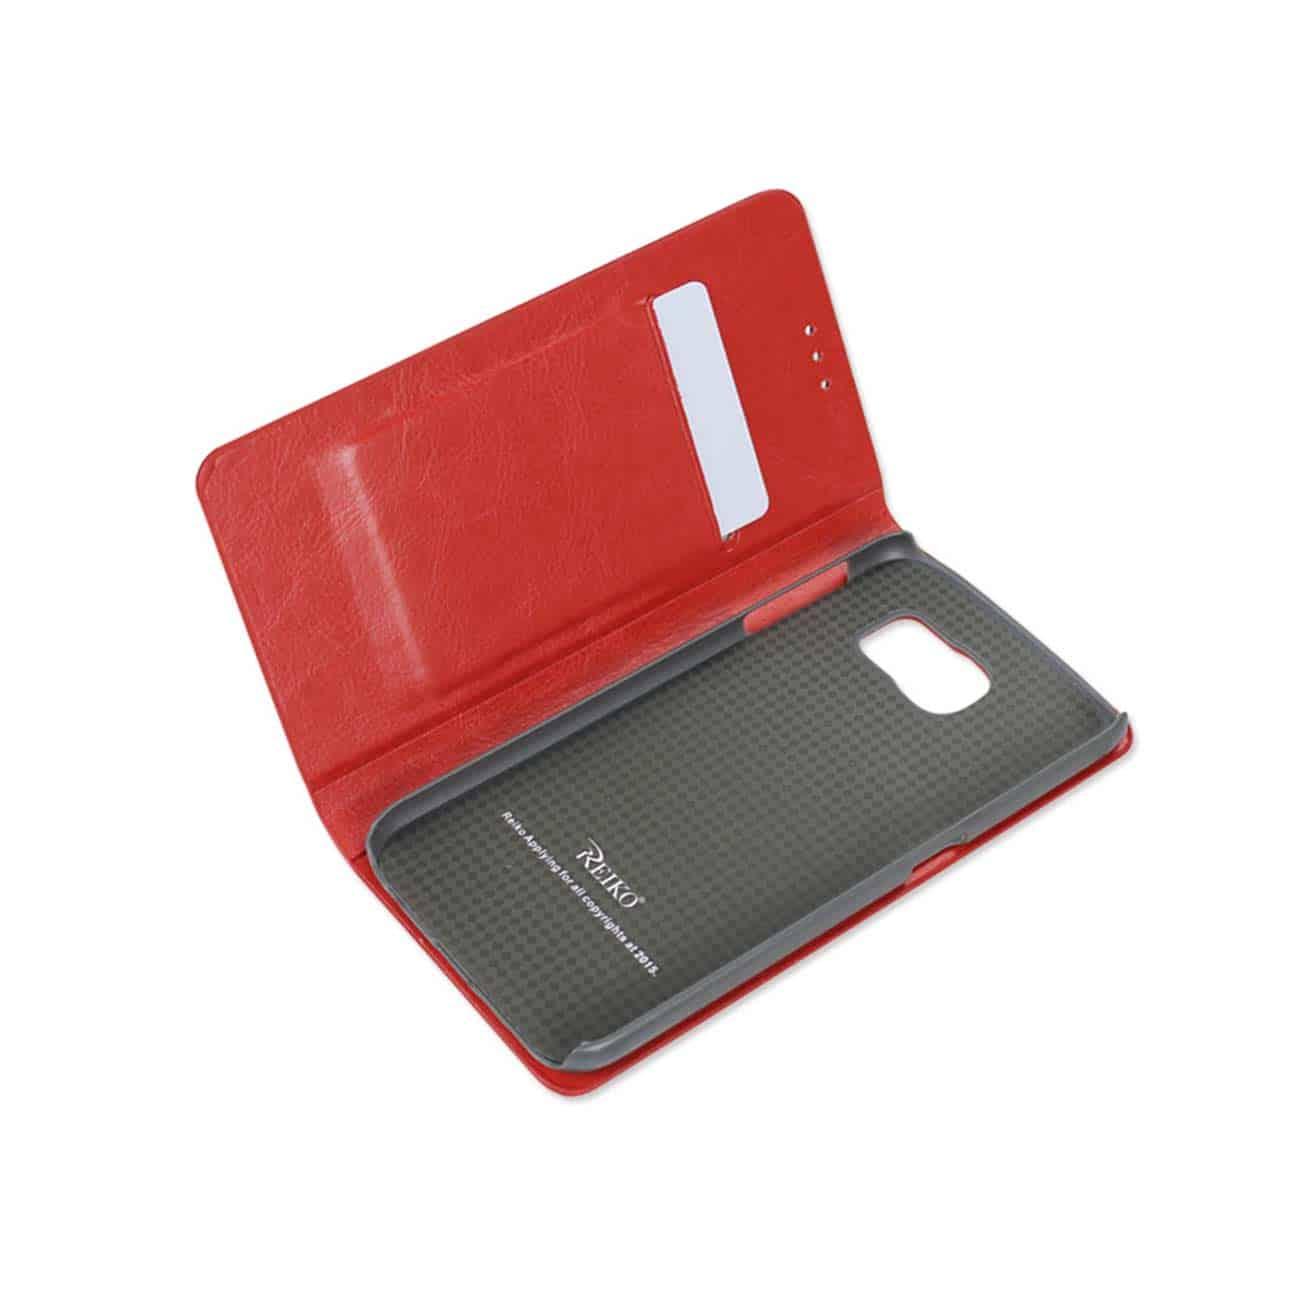 SAMSUNG GALAXY S6 FLIP FOLIO CASE WITH CARD HOLDER IN RED